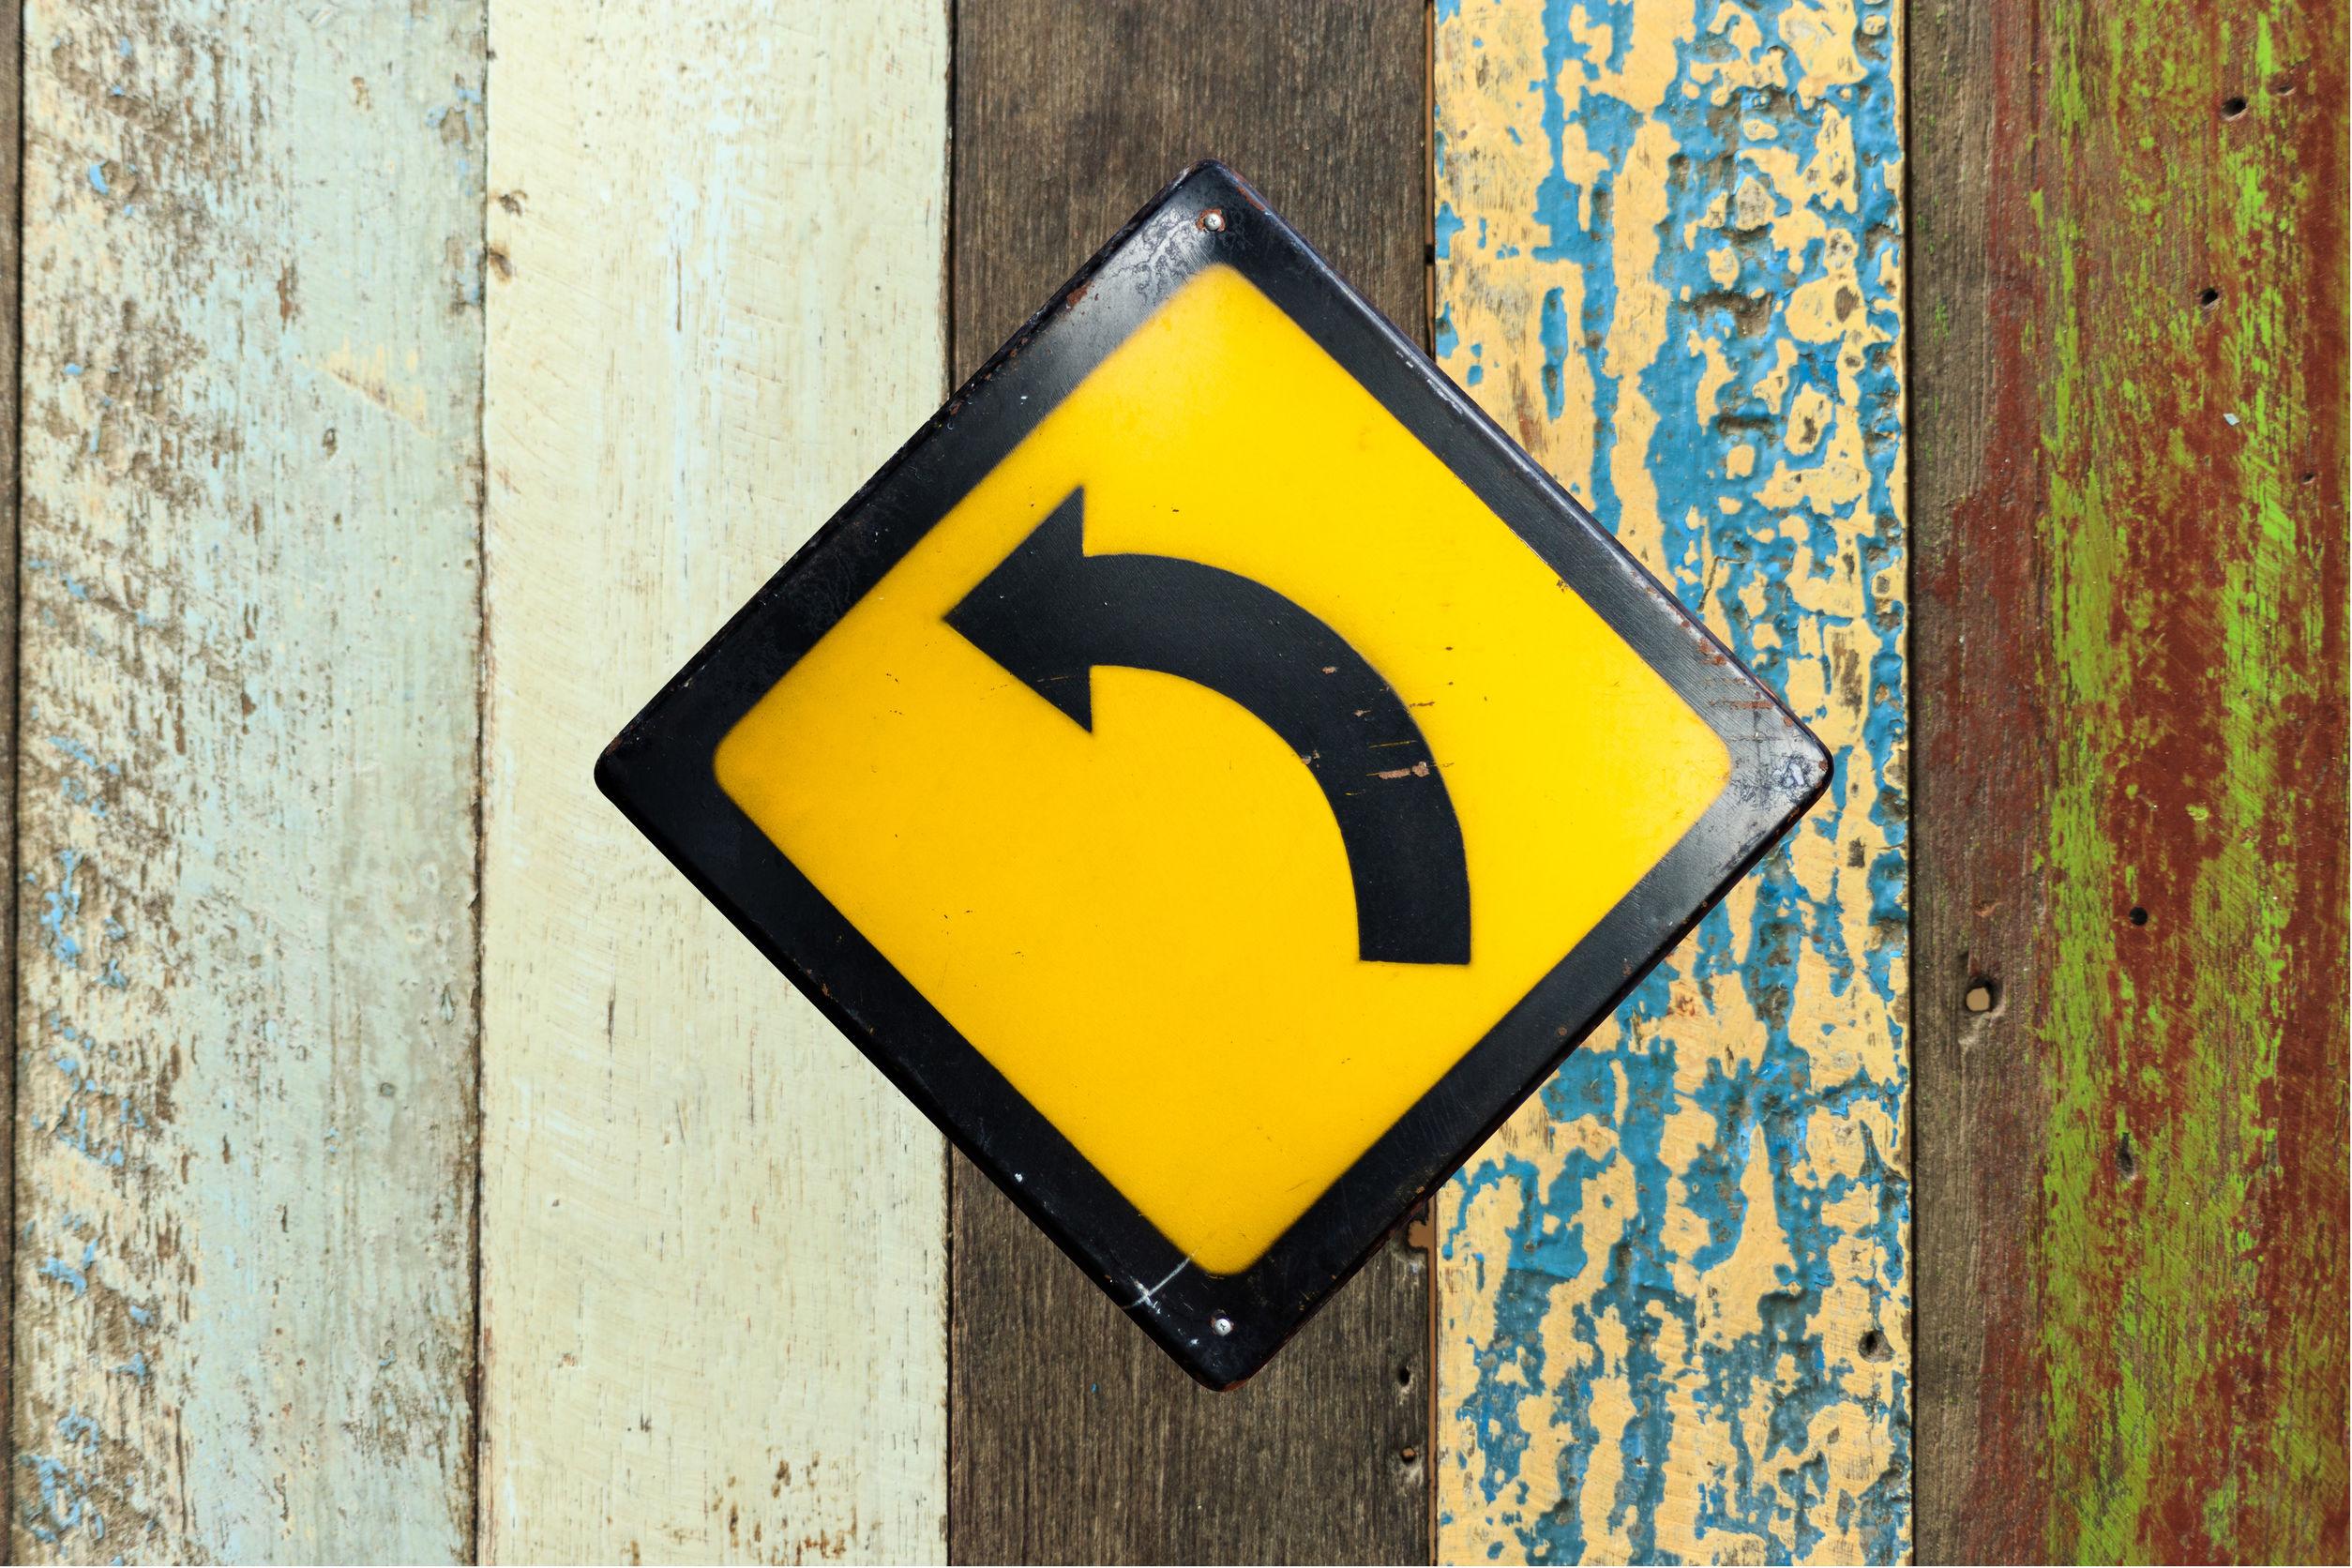 61726282 - turn left sign